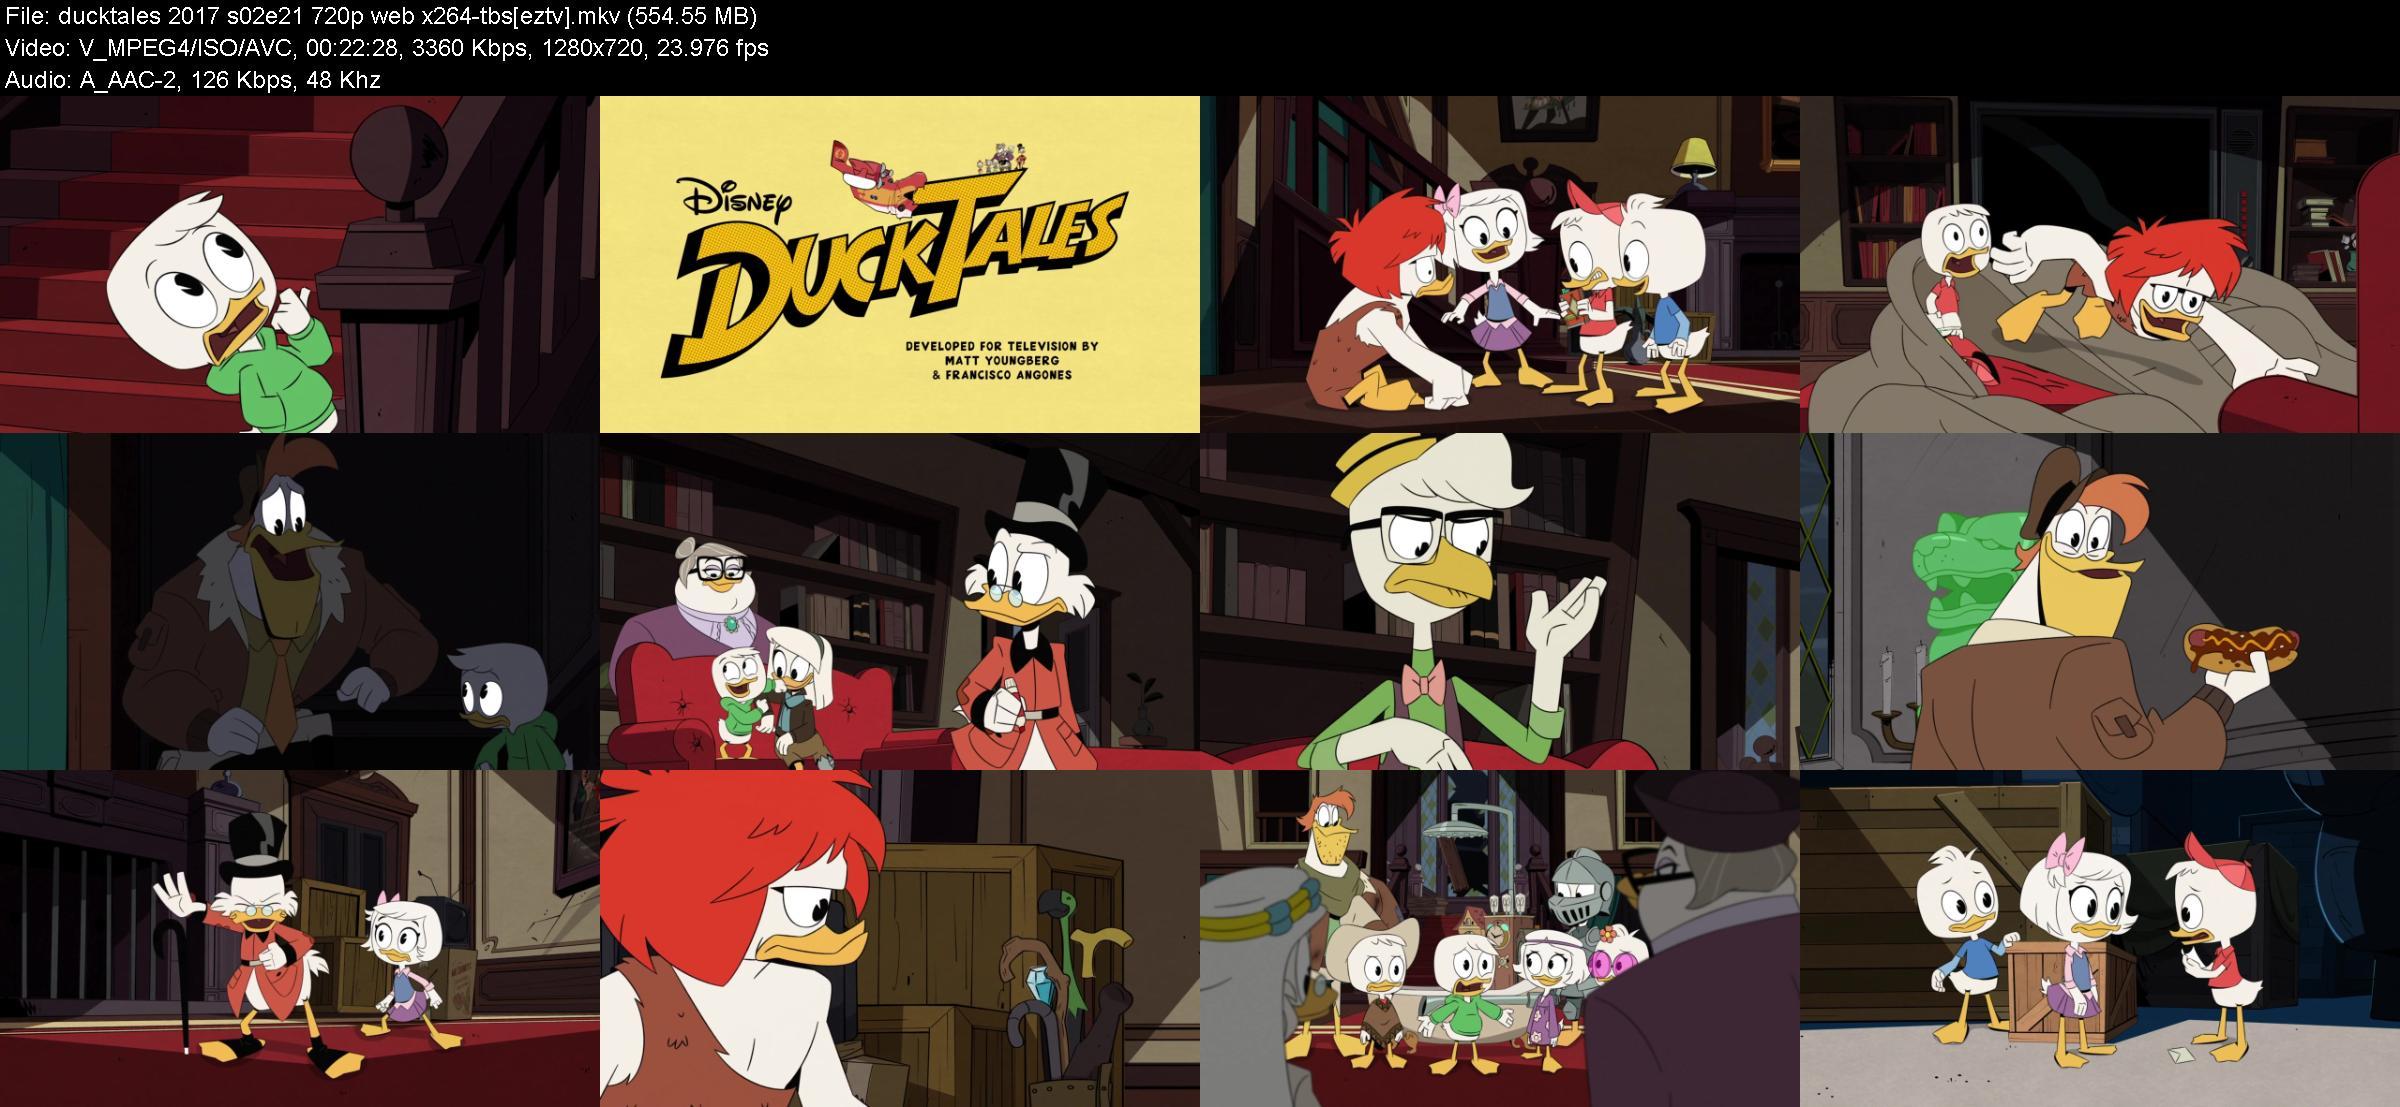 ducktales 2017 s02e21 720p web x264 tbs